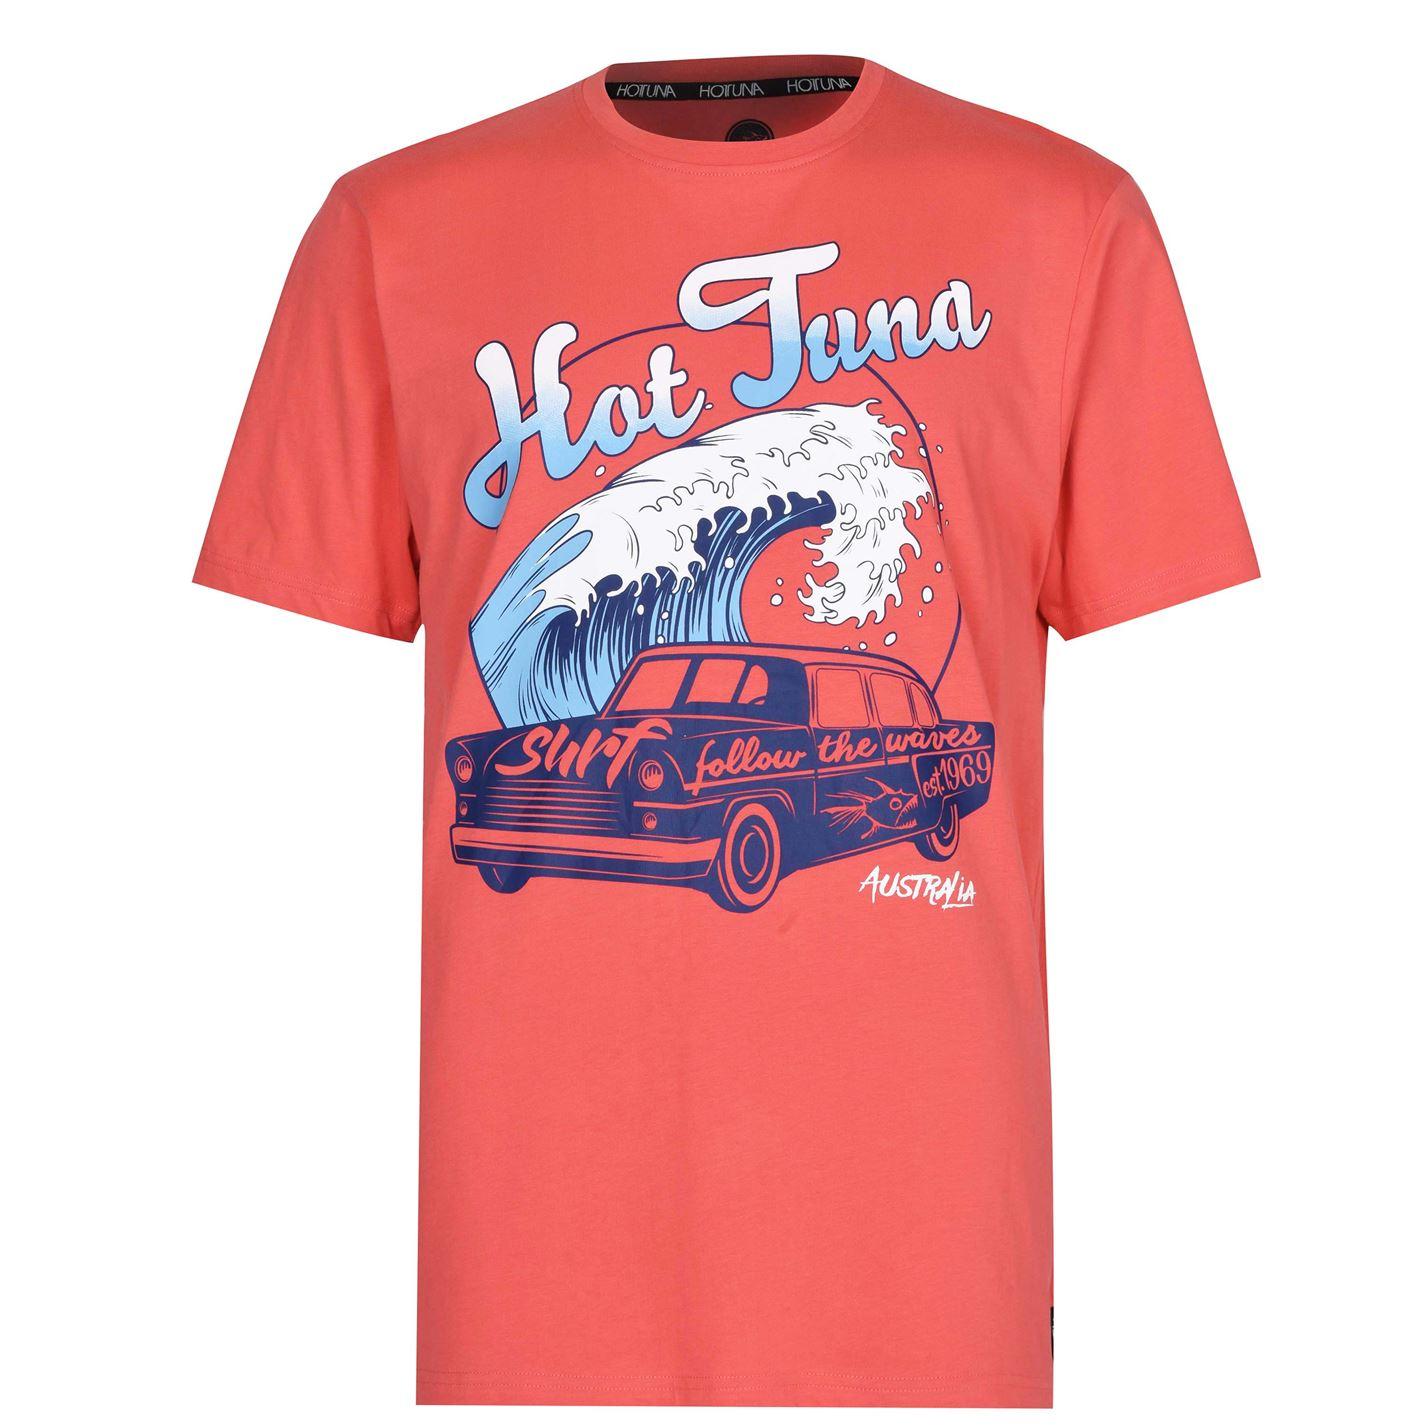 Camasa Hot Tuna Crew T barbat